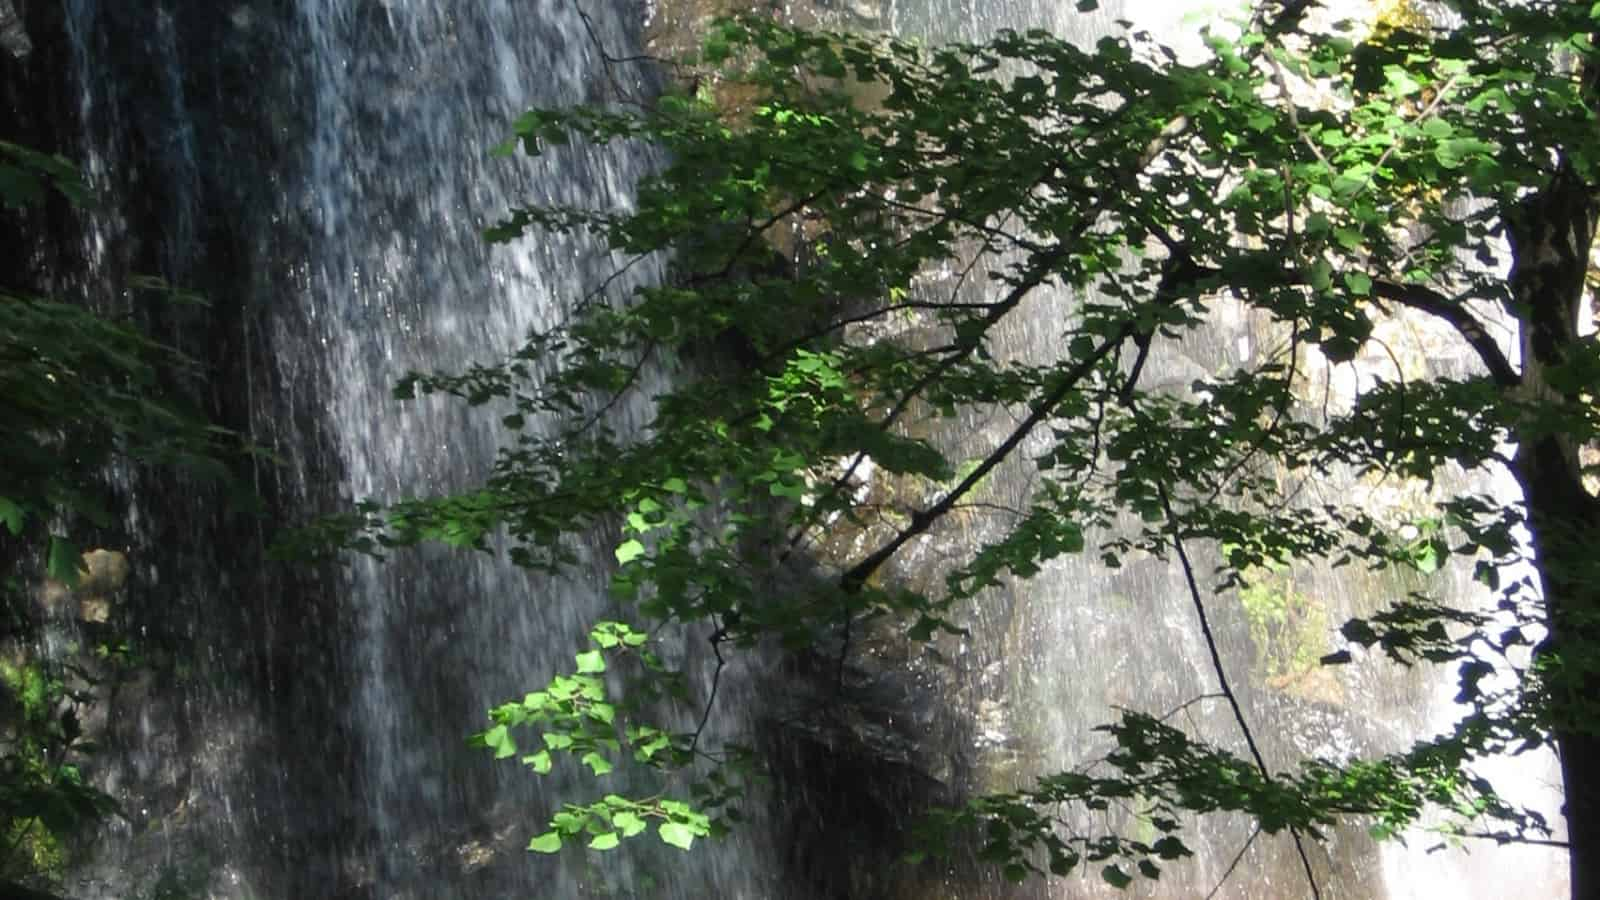 Boyana-Wasserfall - Foto: Vitosha Naturpark